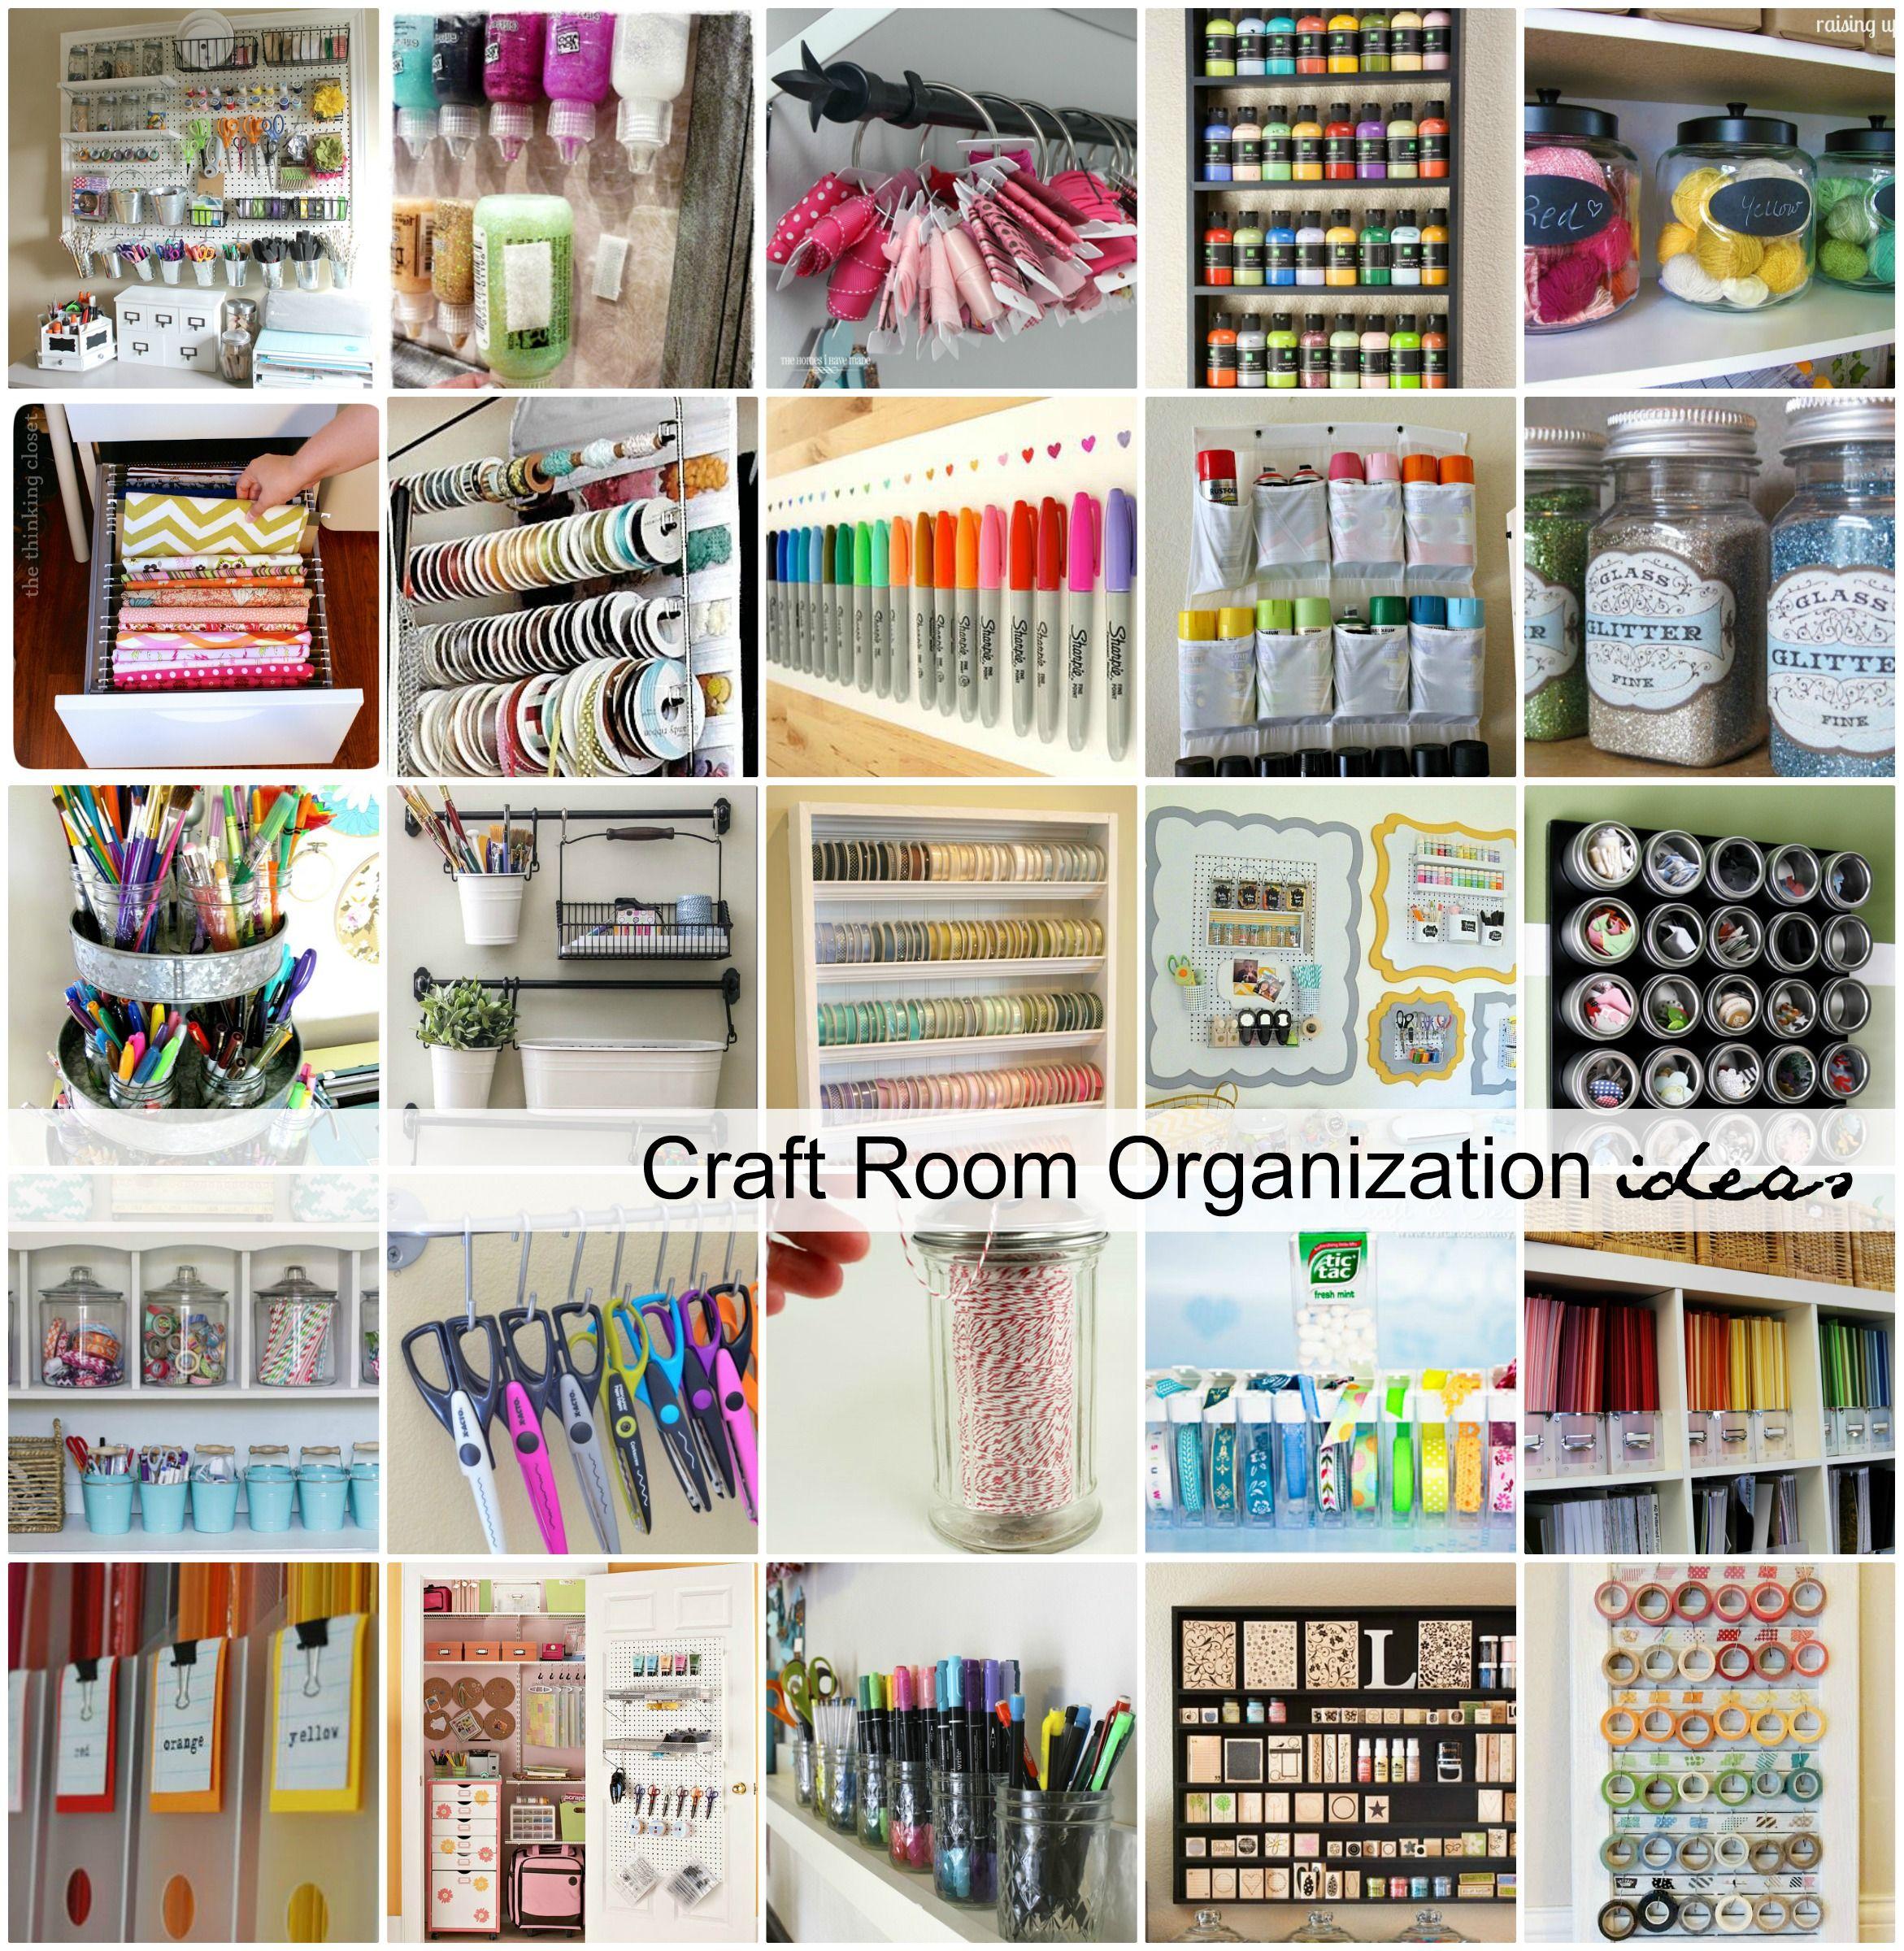 Craft Room Organization And Storage Ideas Craft Room Closet Craft Room Design Craft Room Organization